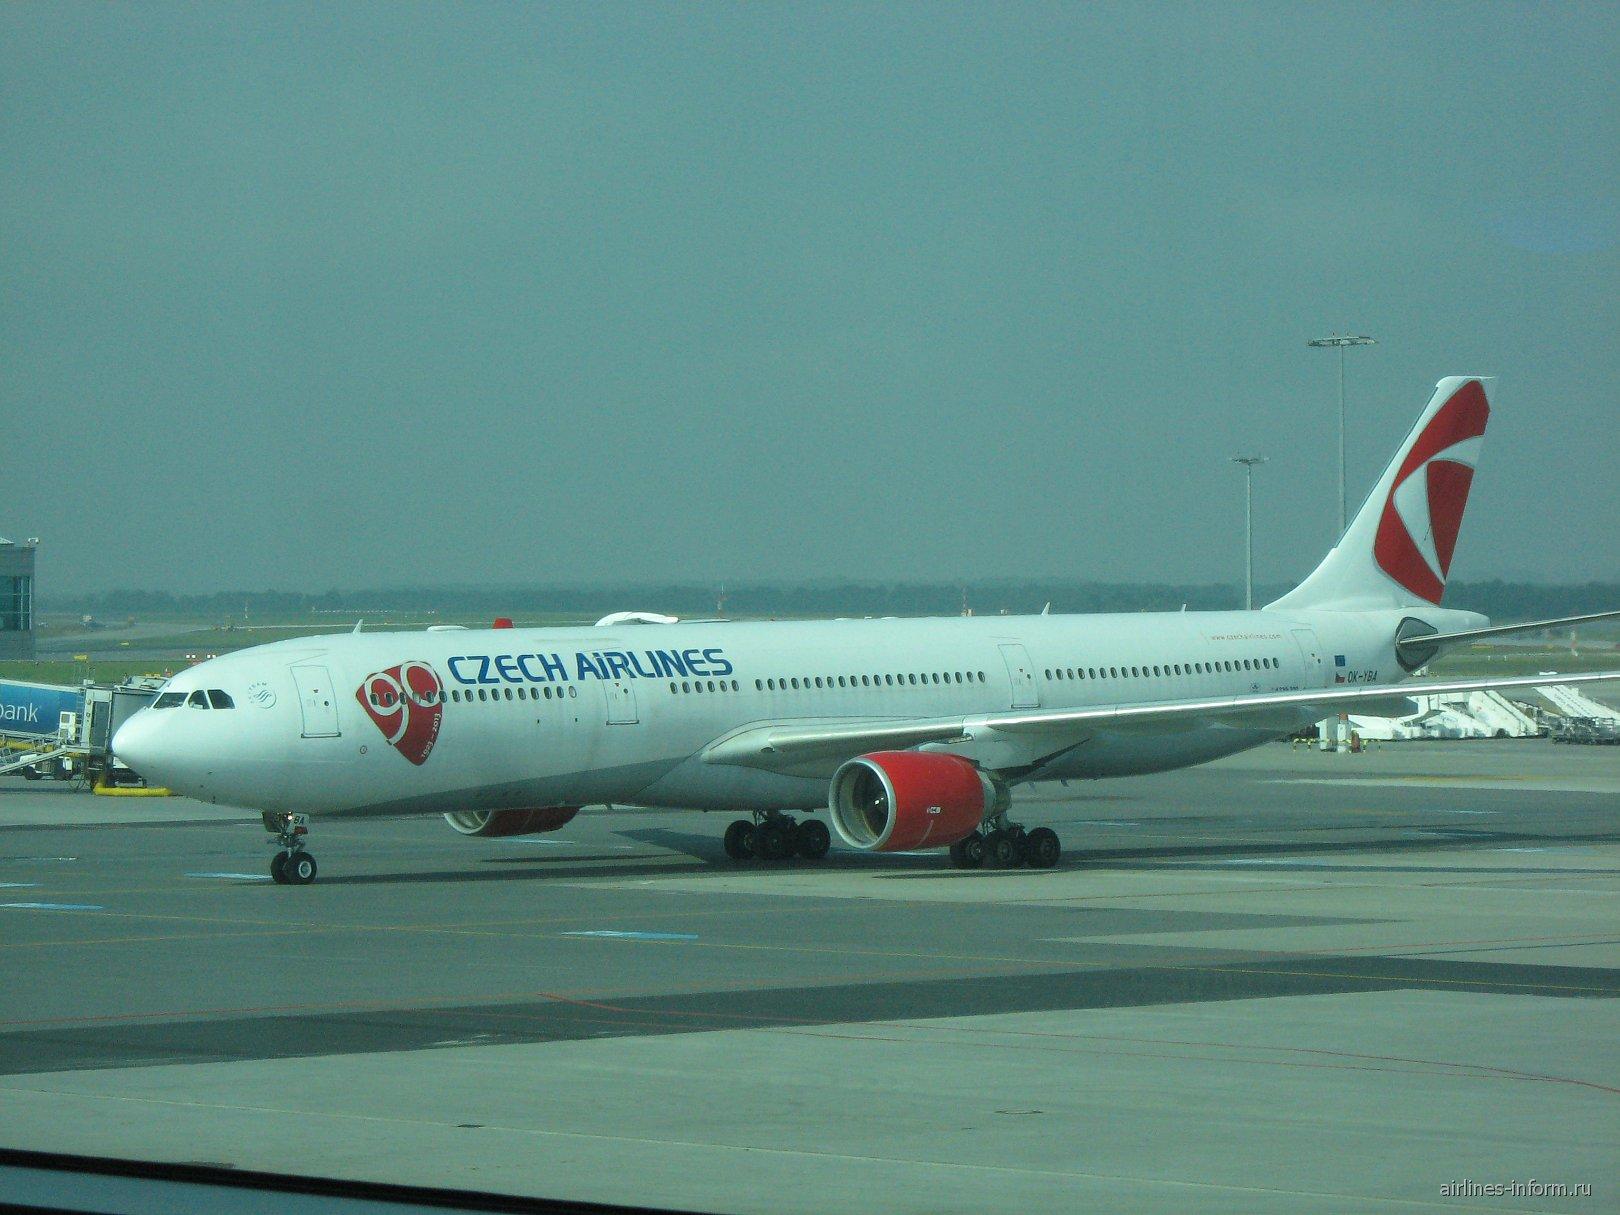 Airbus A330-300 Чешских авиалиний в аэропорту Праги